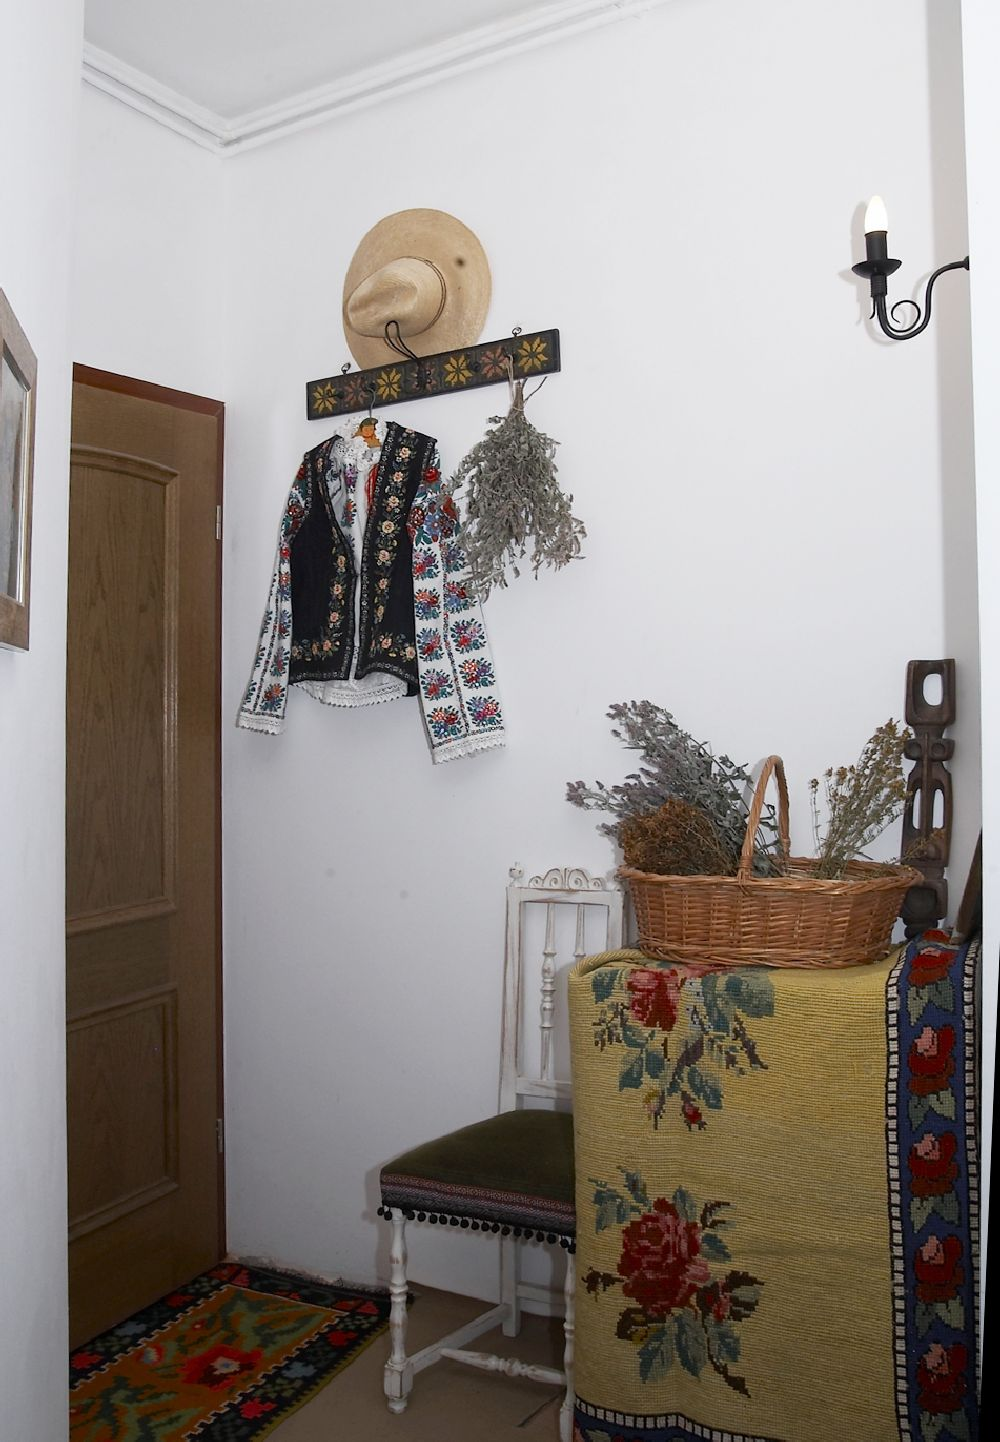 adelaparvu.com despre Anca Ciuciulin si casa ei cu decor traditional romanesc (7)